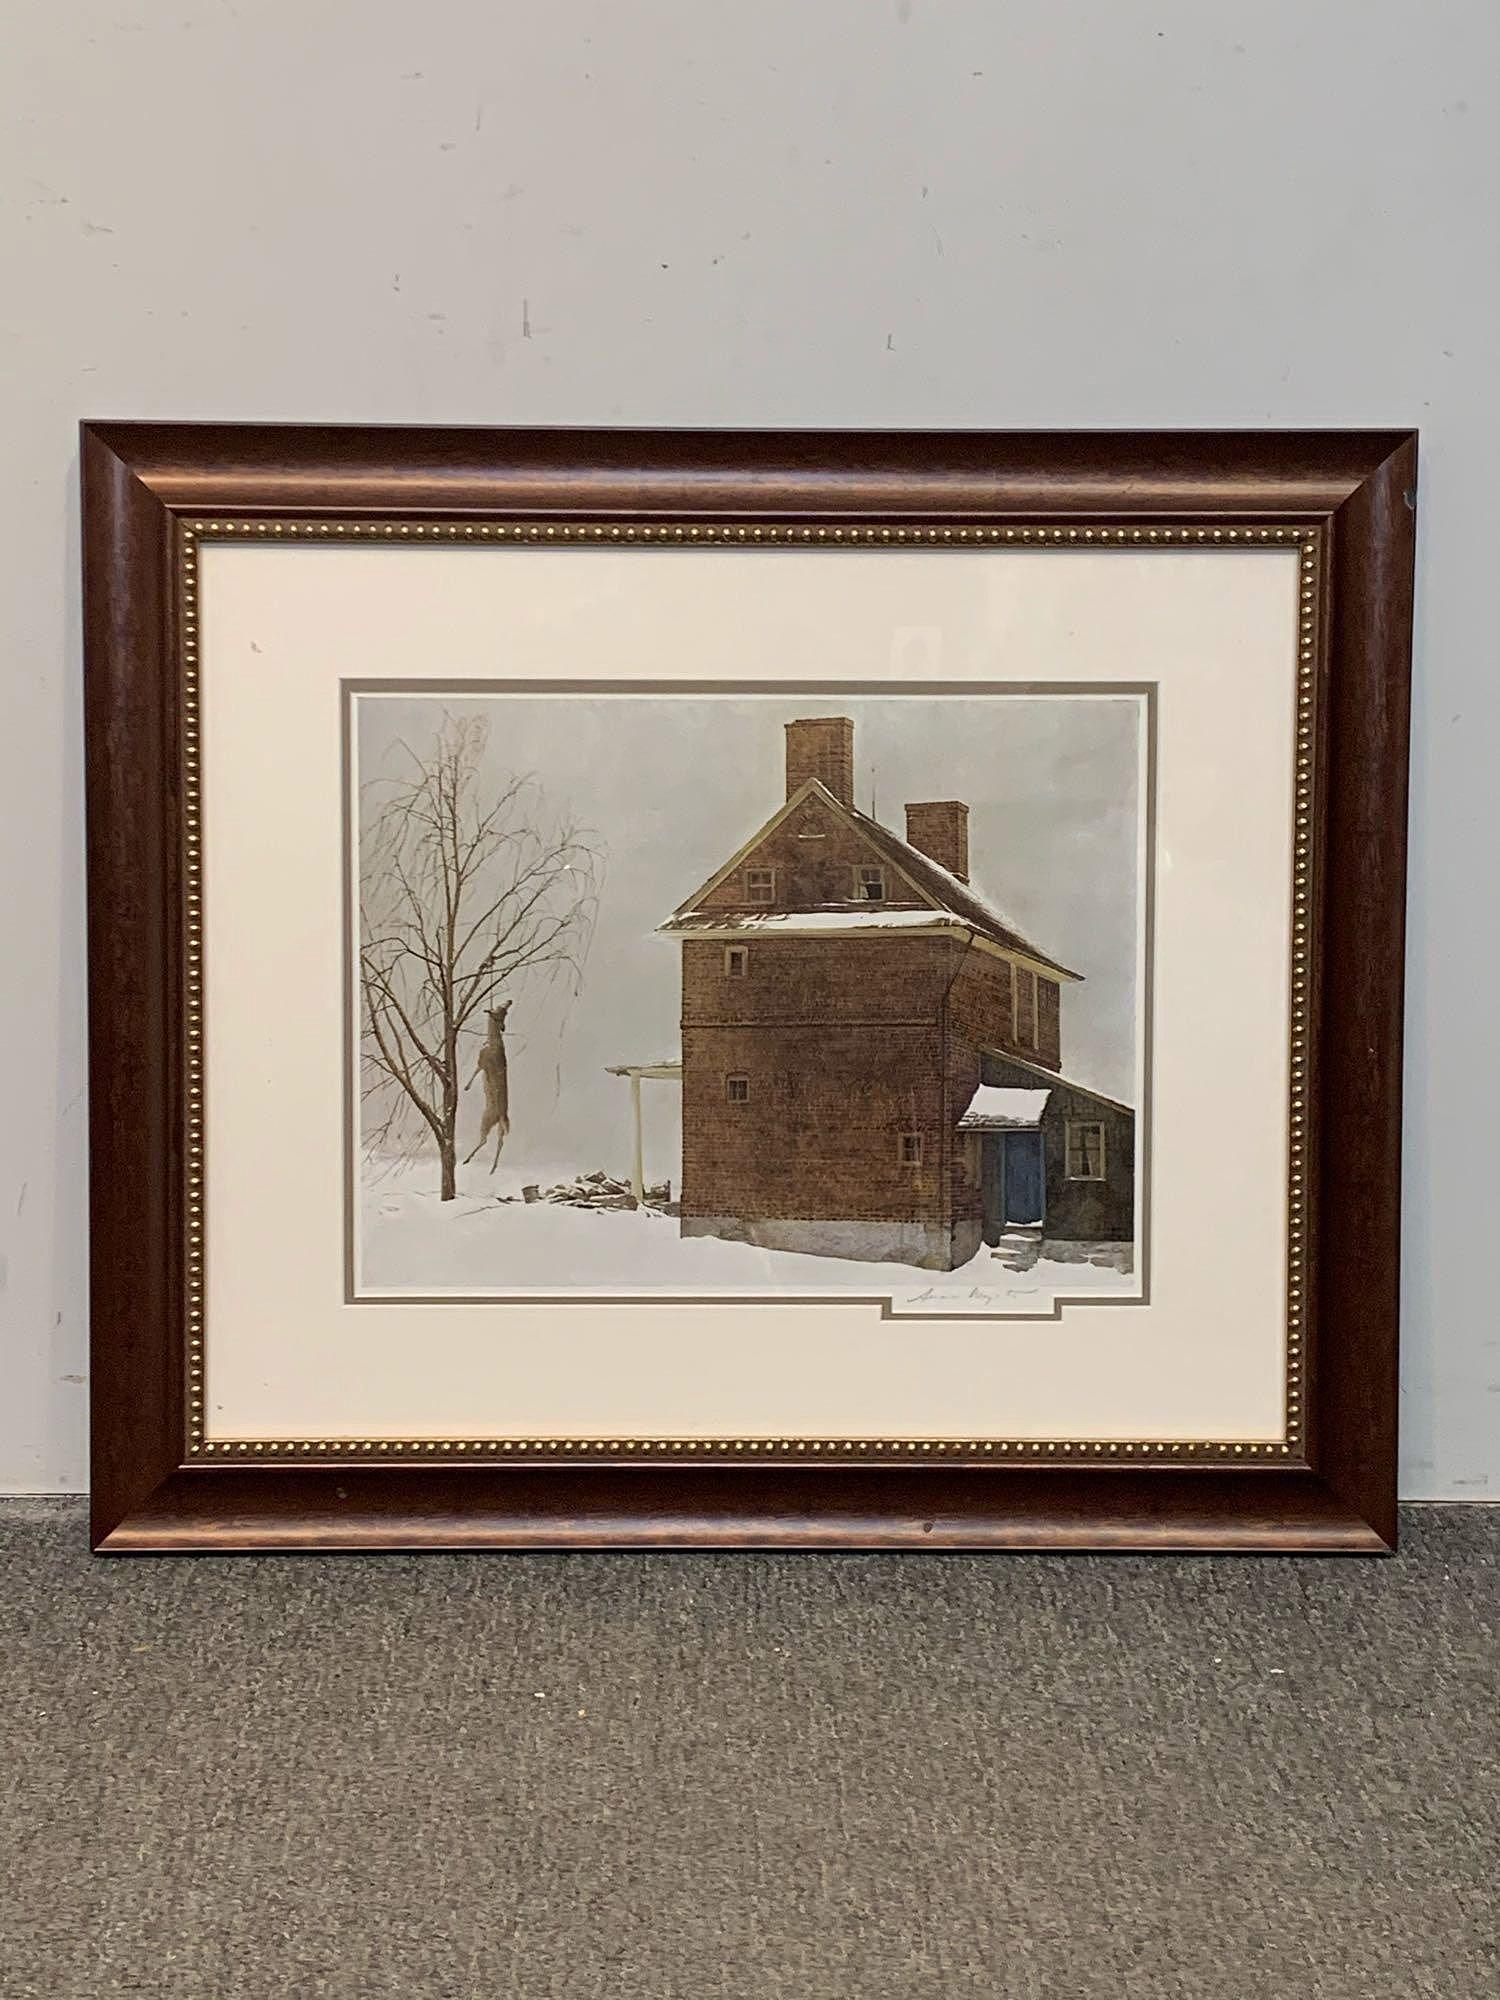 Andrew Wyeth. Signed Print, Tenant Farmer